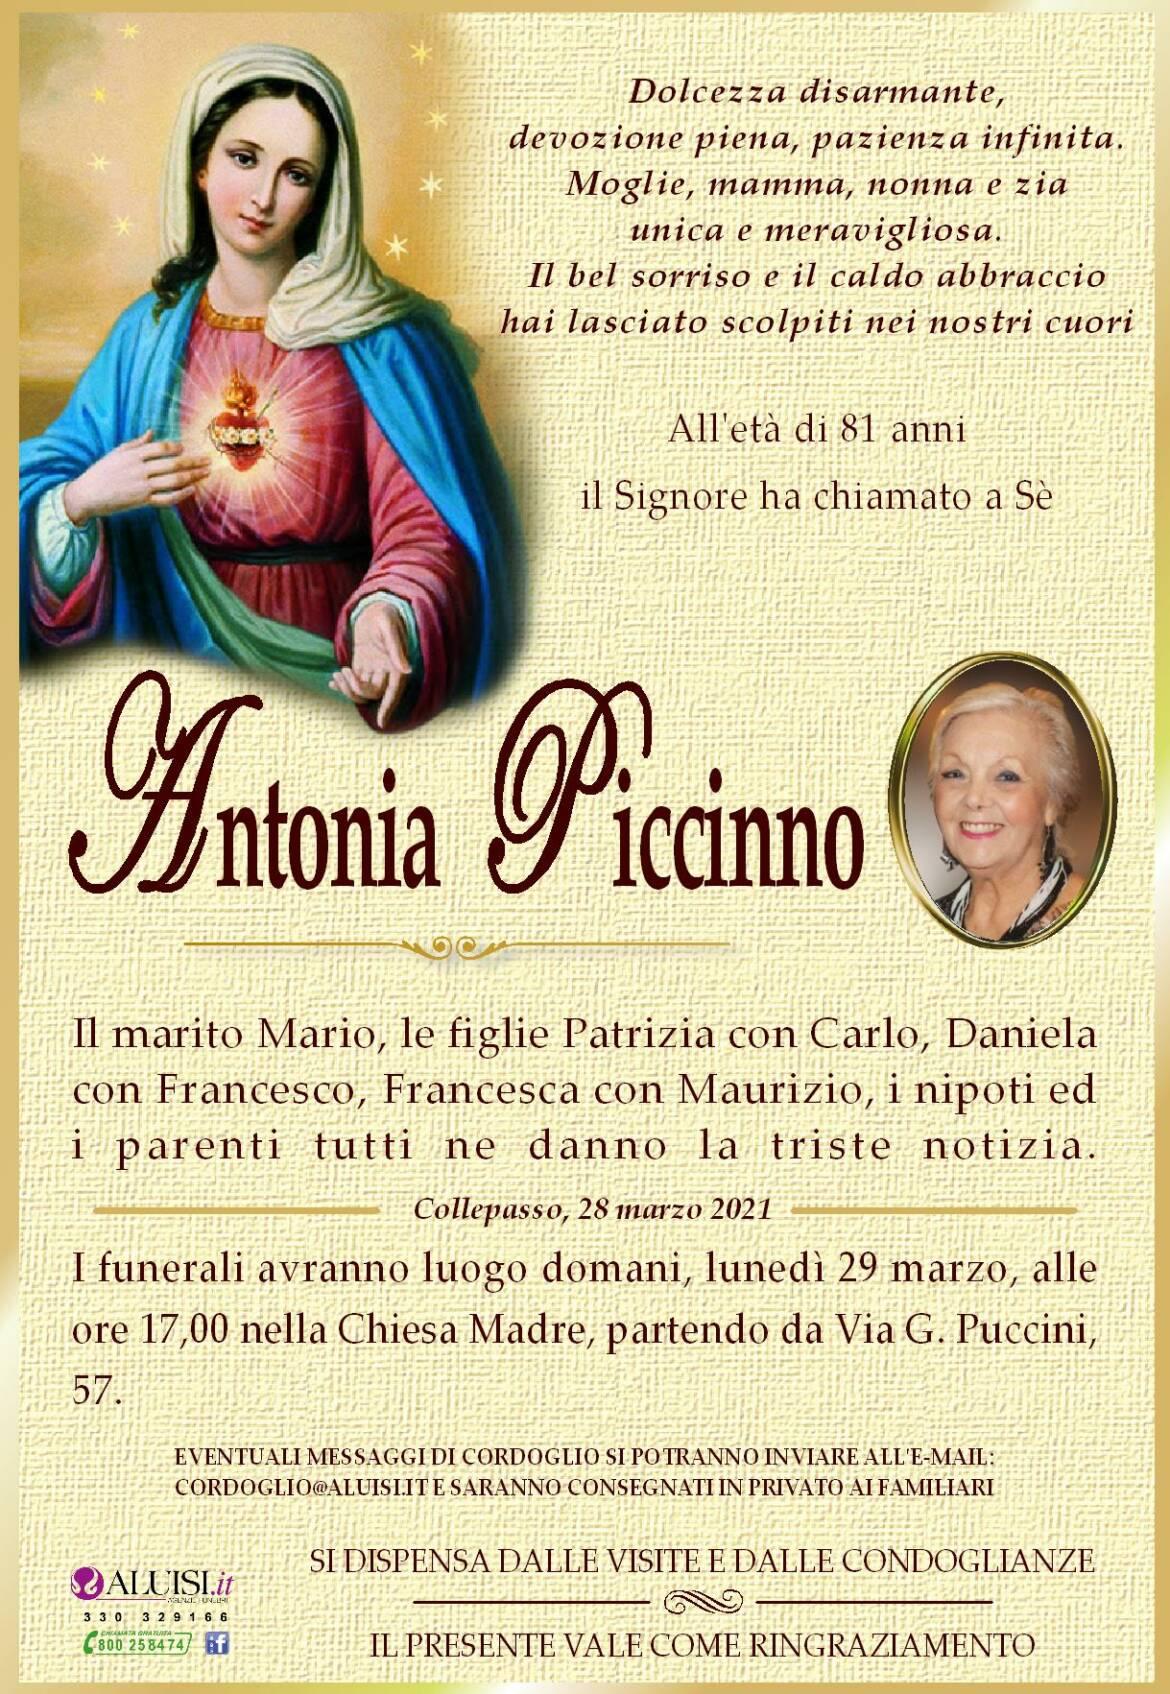 Annuncio-ANTONIA-PICCINNO-COLLEPASSO-1.jpg